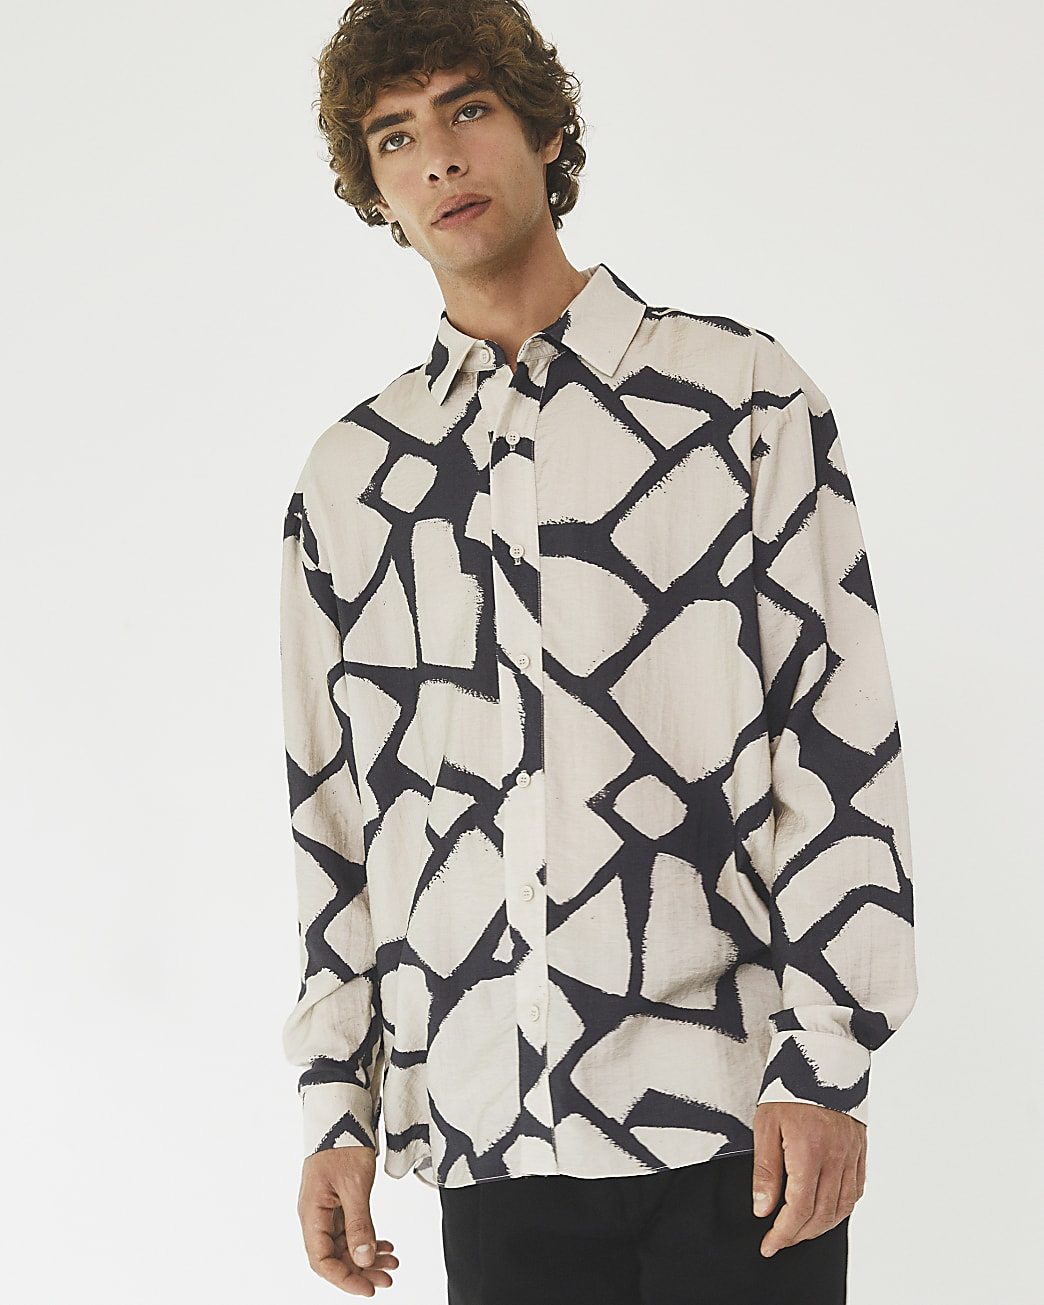 Ecru RI Studio marble print long sleeve shirt